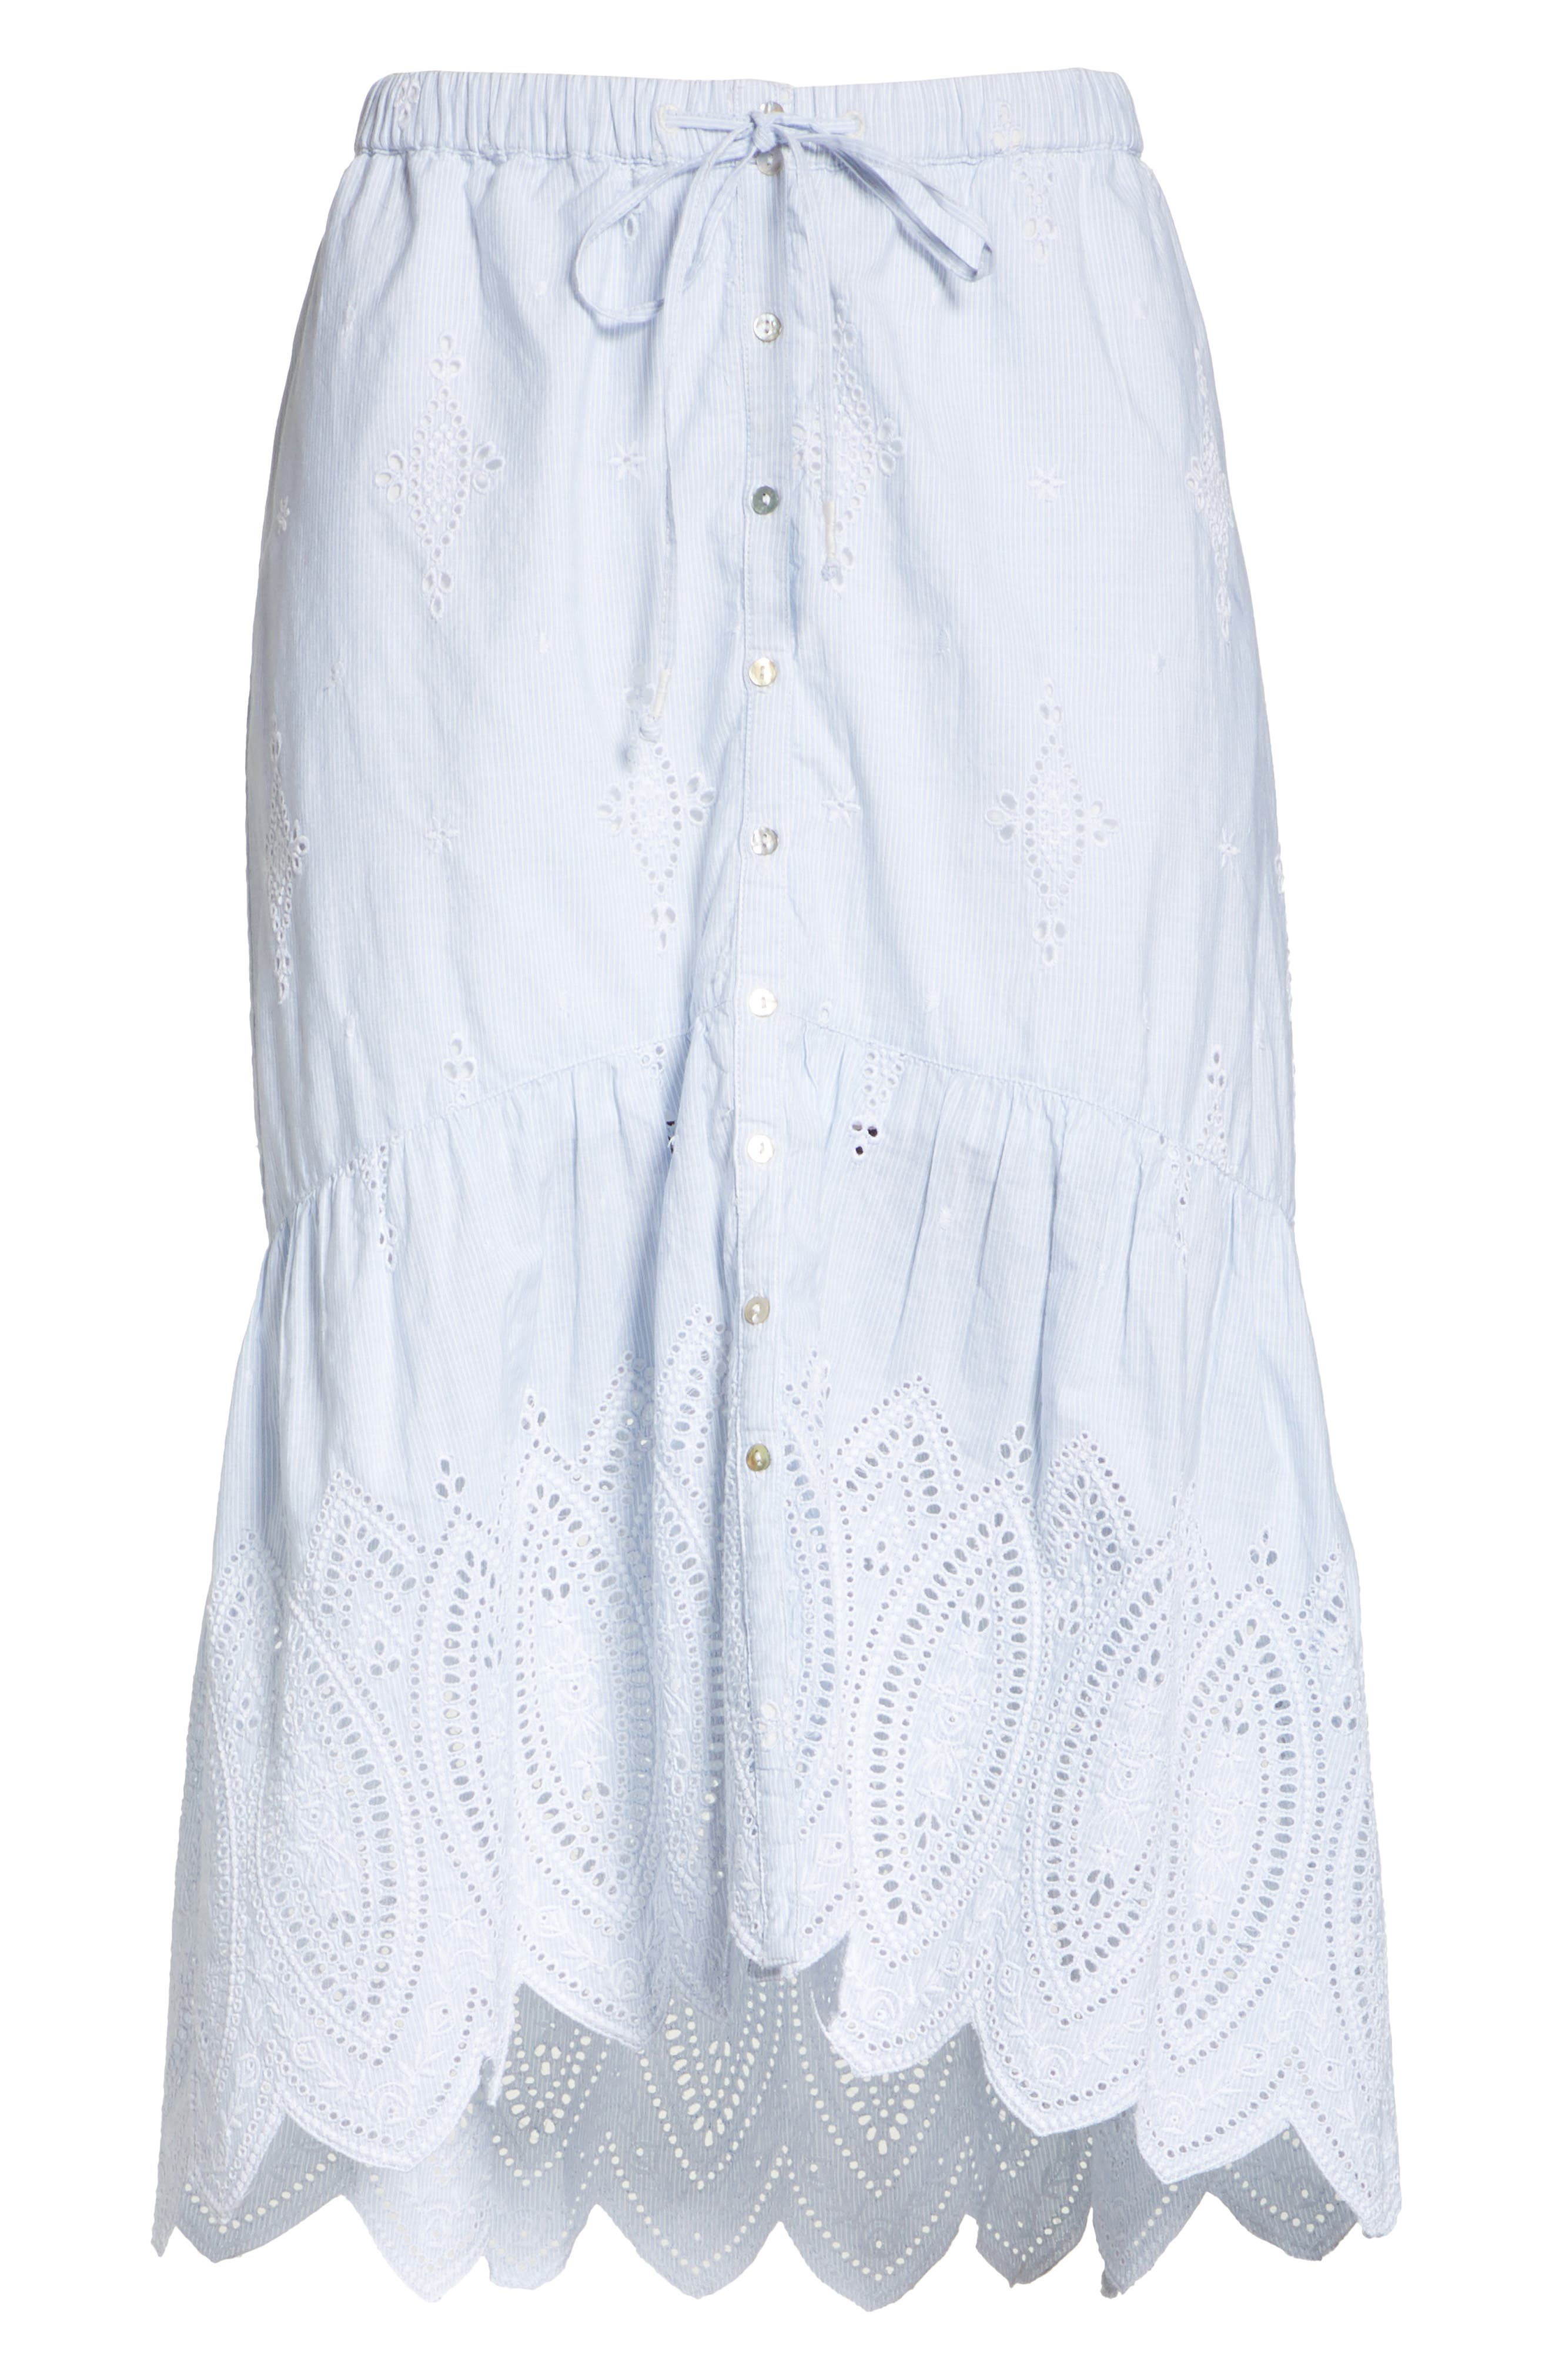 Chantoya Eyelet Scallop Hem Cotton Skirt,                             Alternate thumbnail 6, color,                             Desert Sky